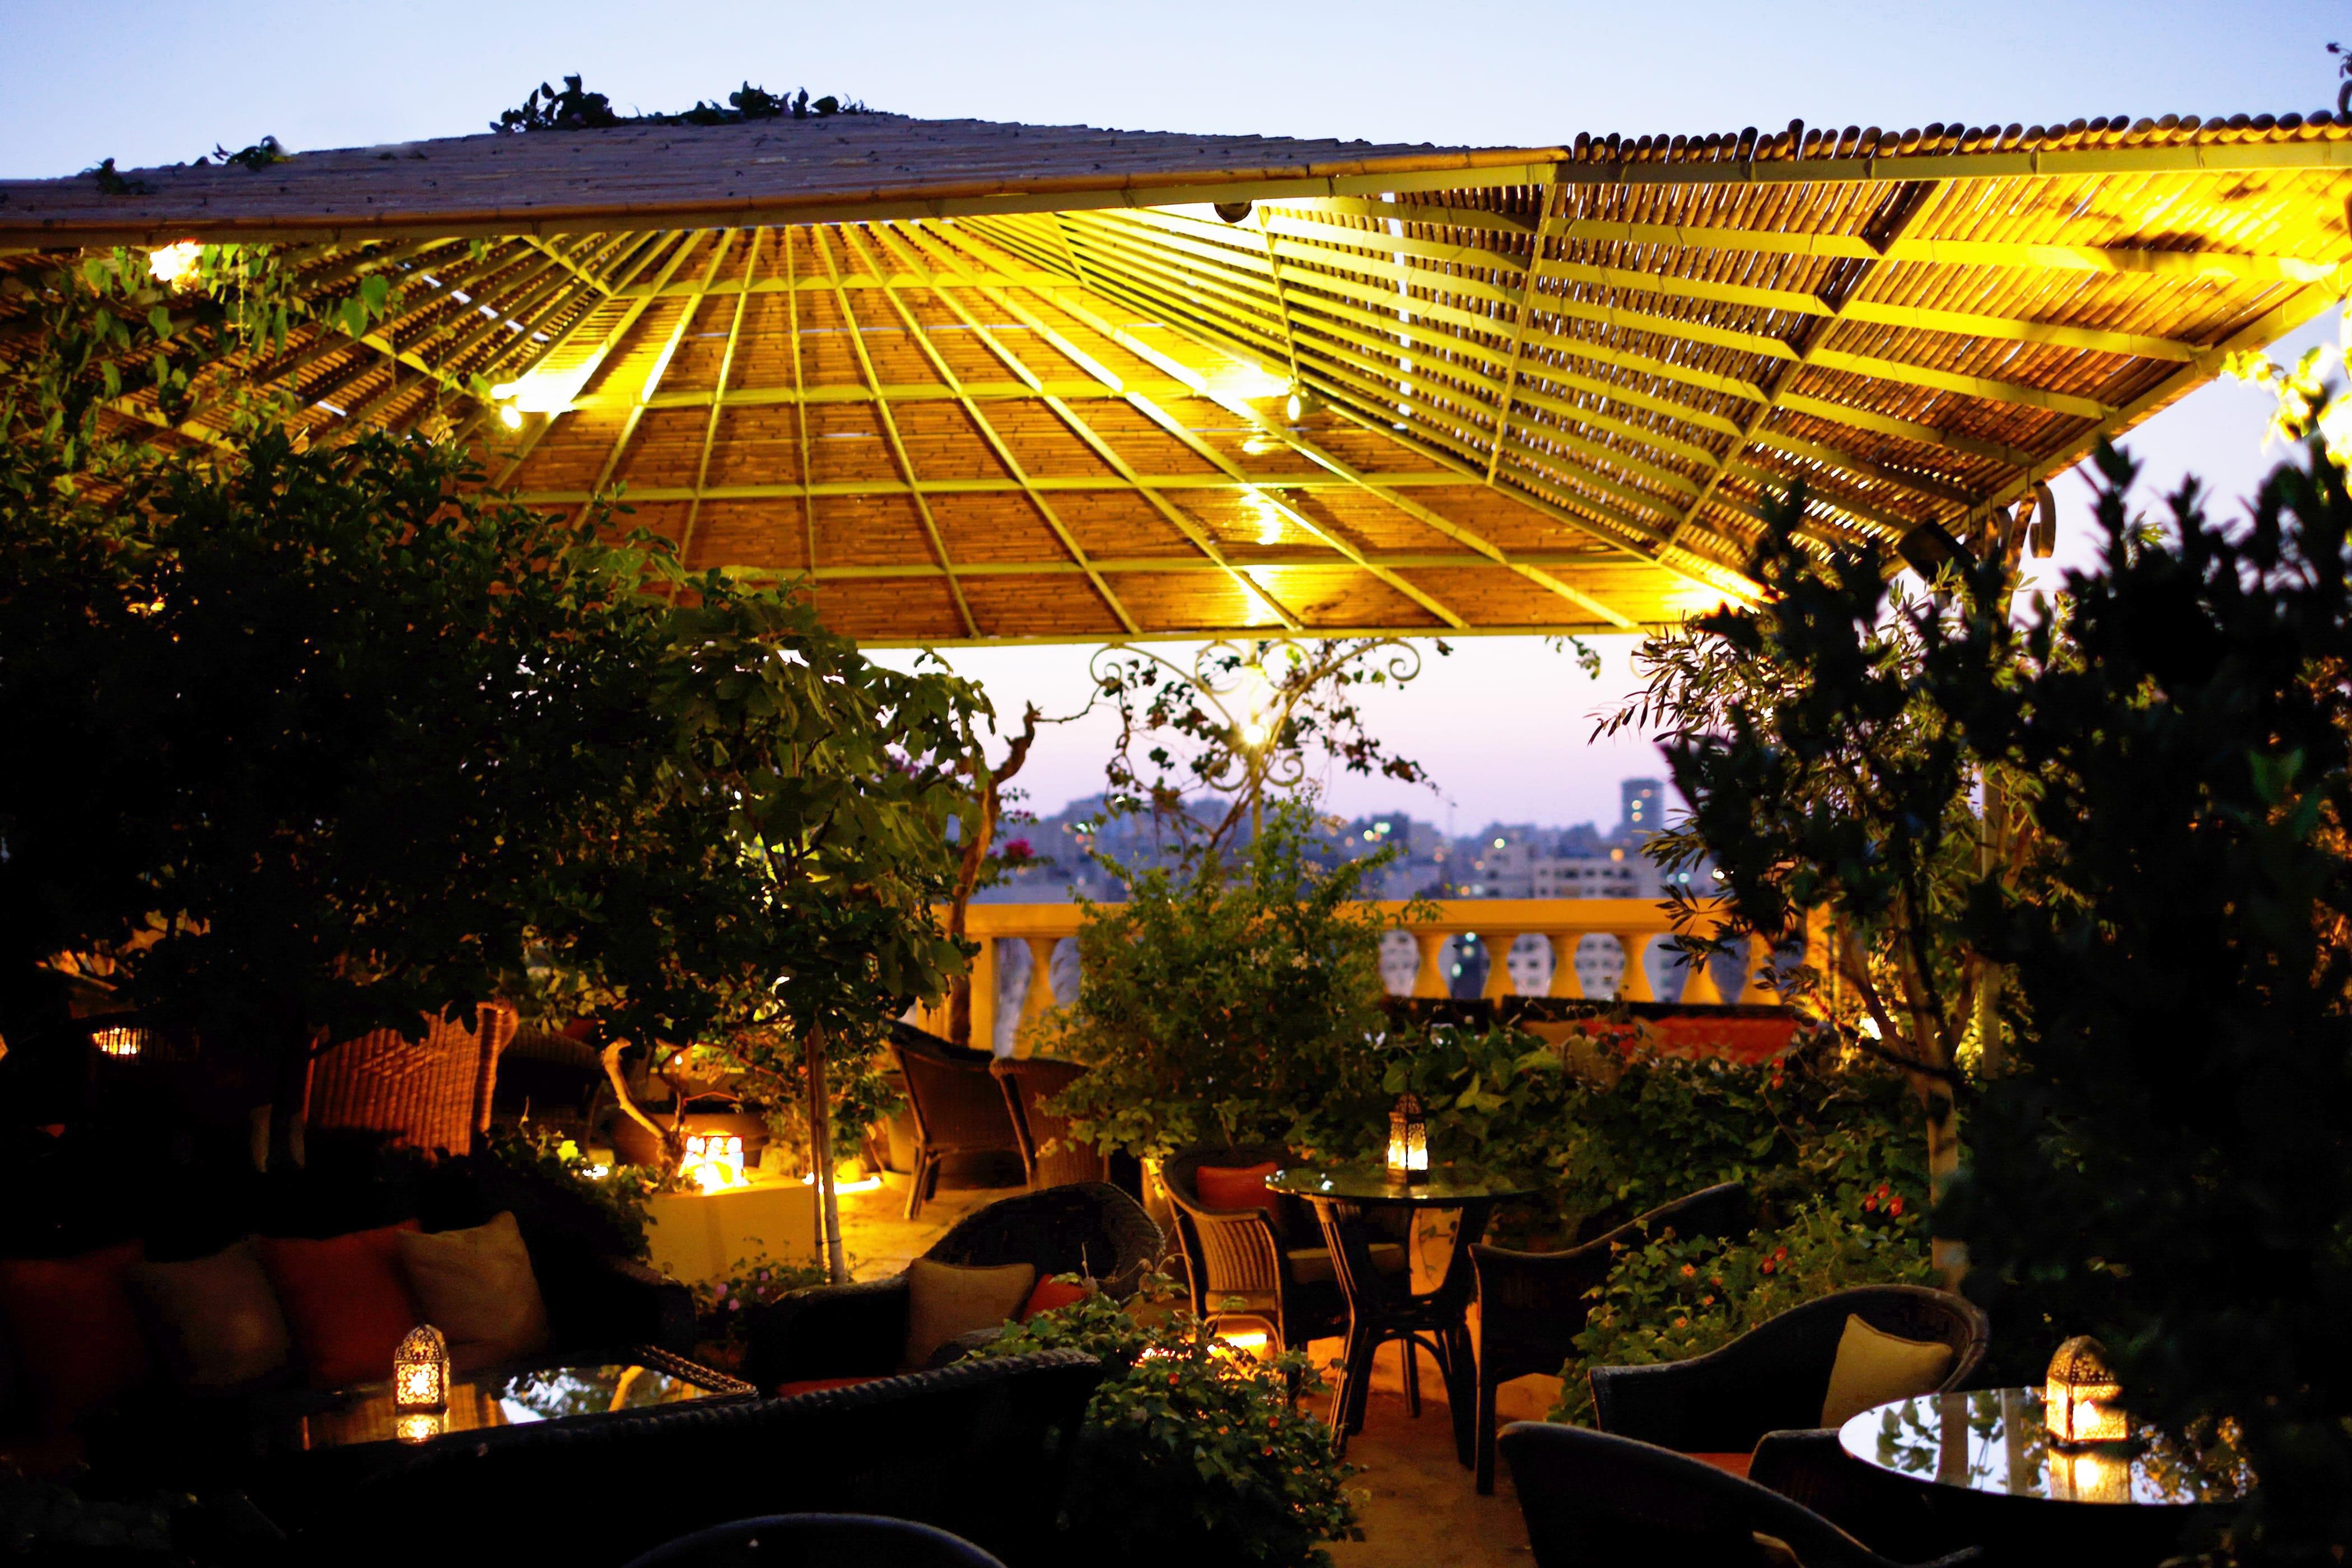 [Night Terrace, Albergo Hotel] | Courtesy of [Albergo Hotel]